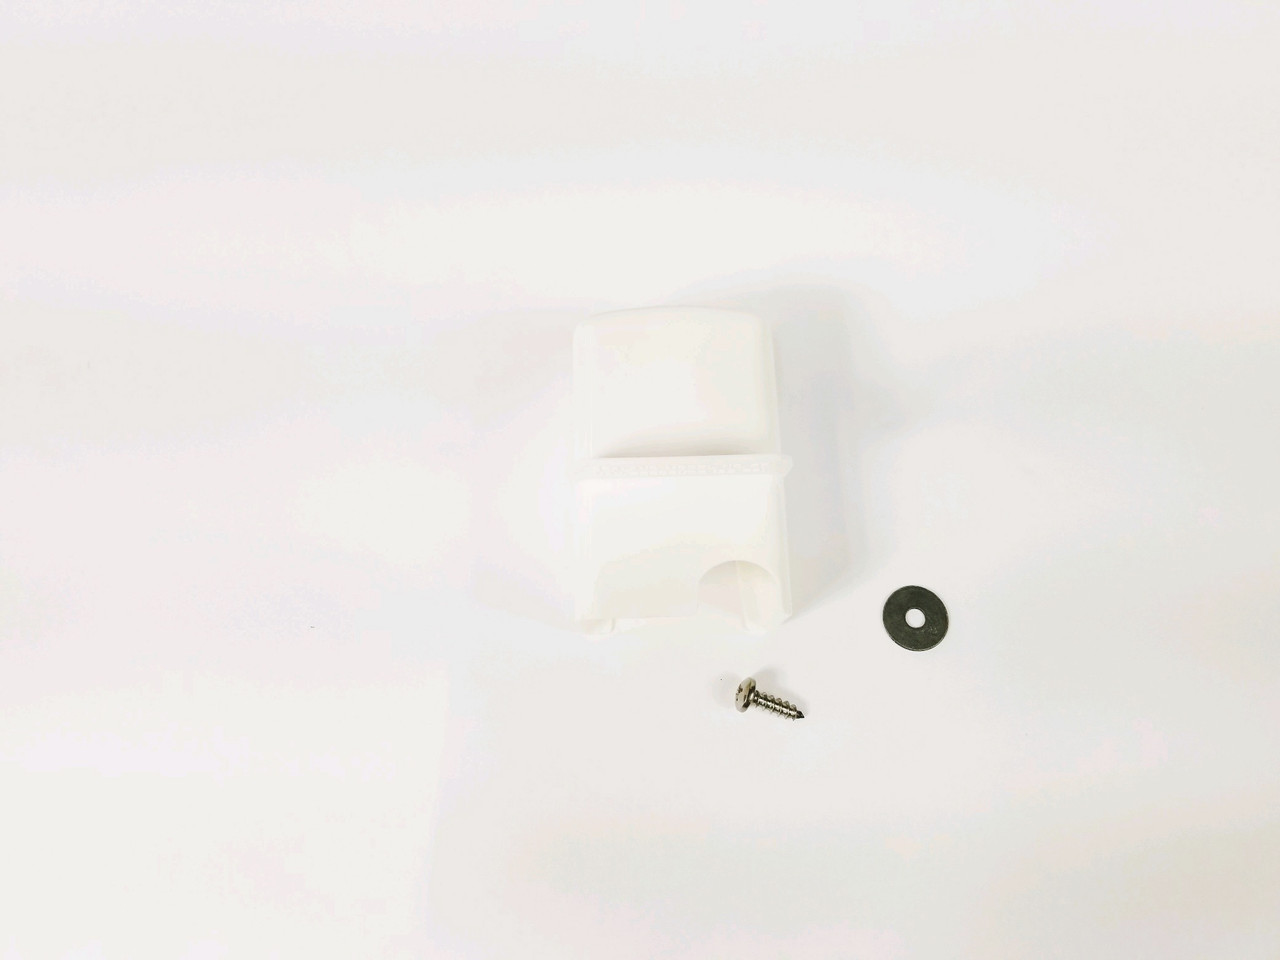 KIT, ECOVAC VB COVER-WHITE - 310696 (385310696)